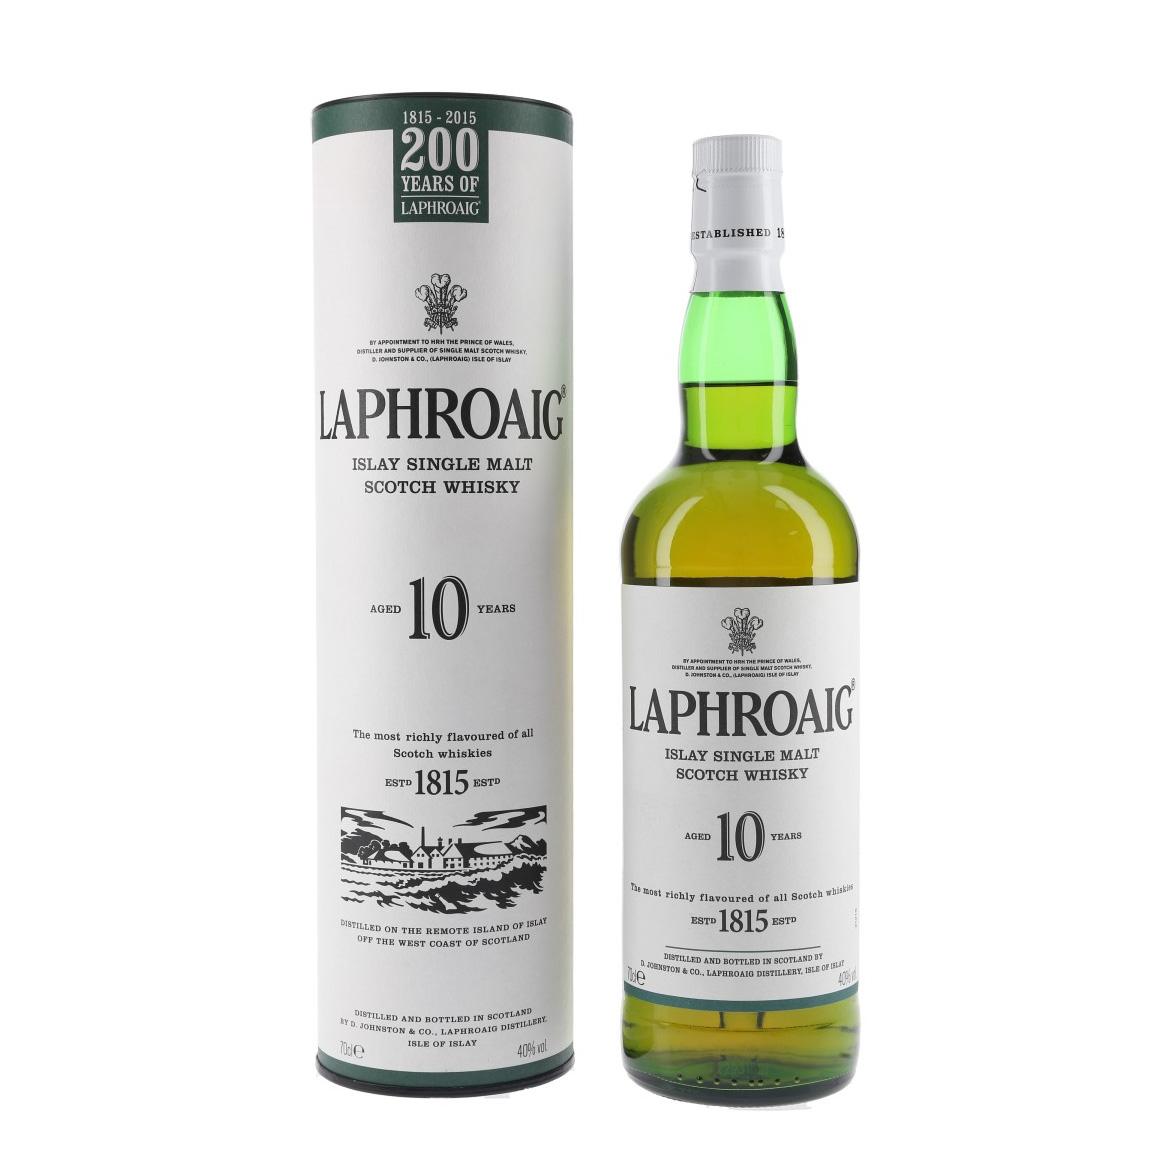 Laphroaig 10 Year Old Single Malt Scotch Whisky (200th Anniversary Edition)